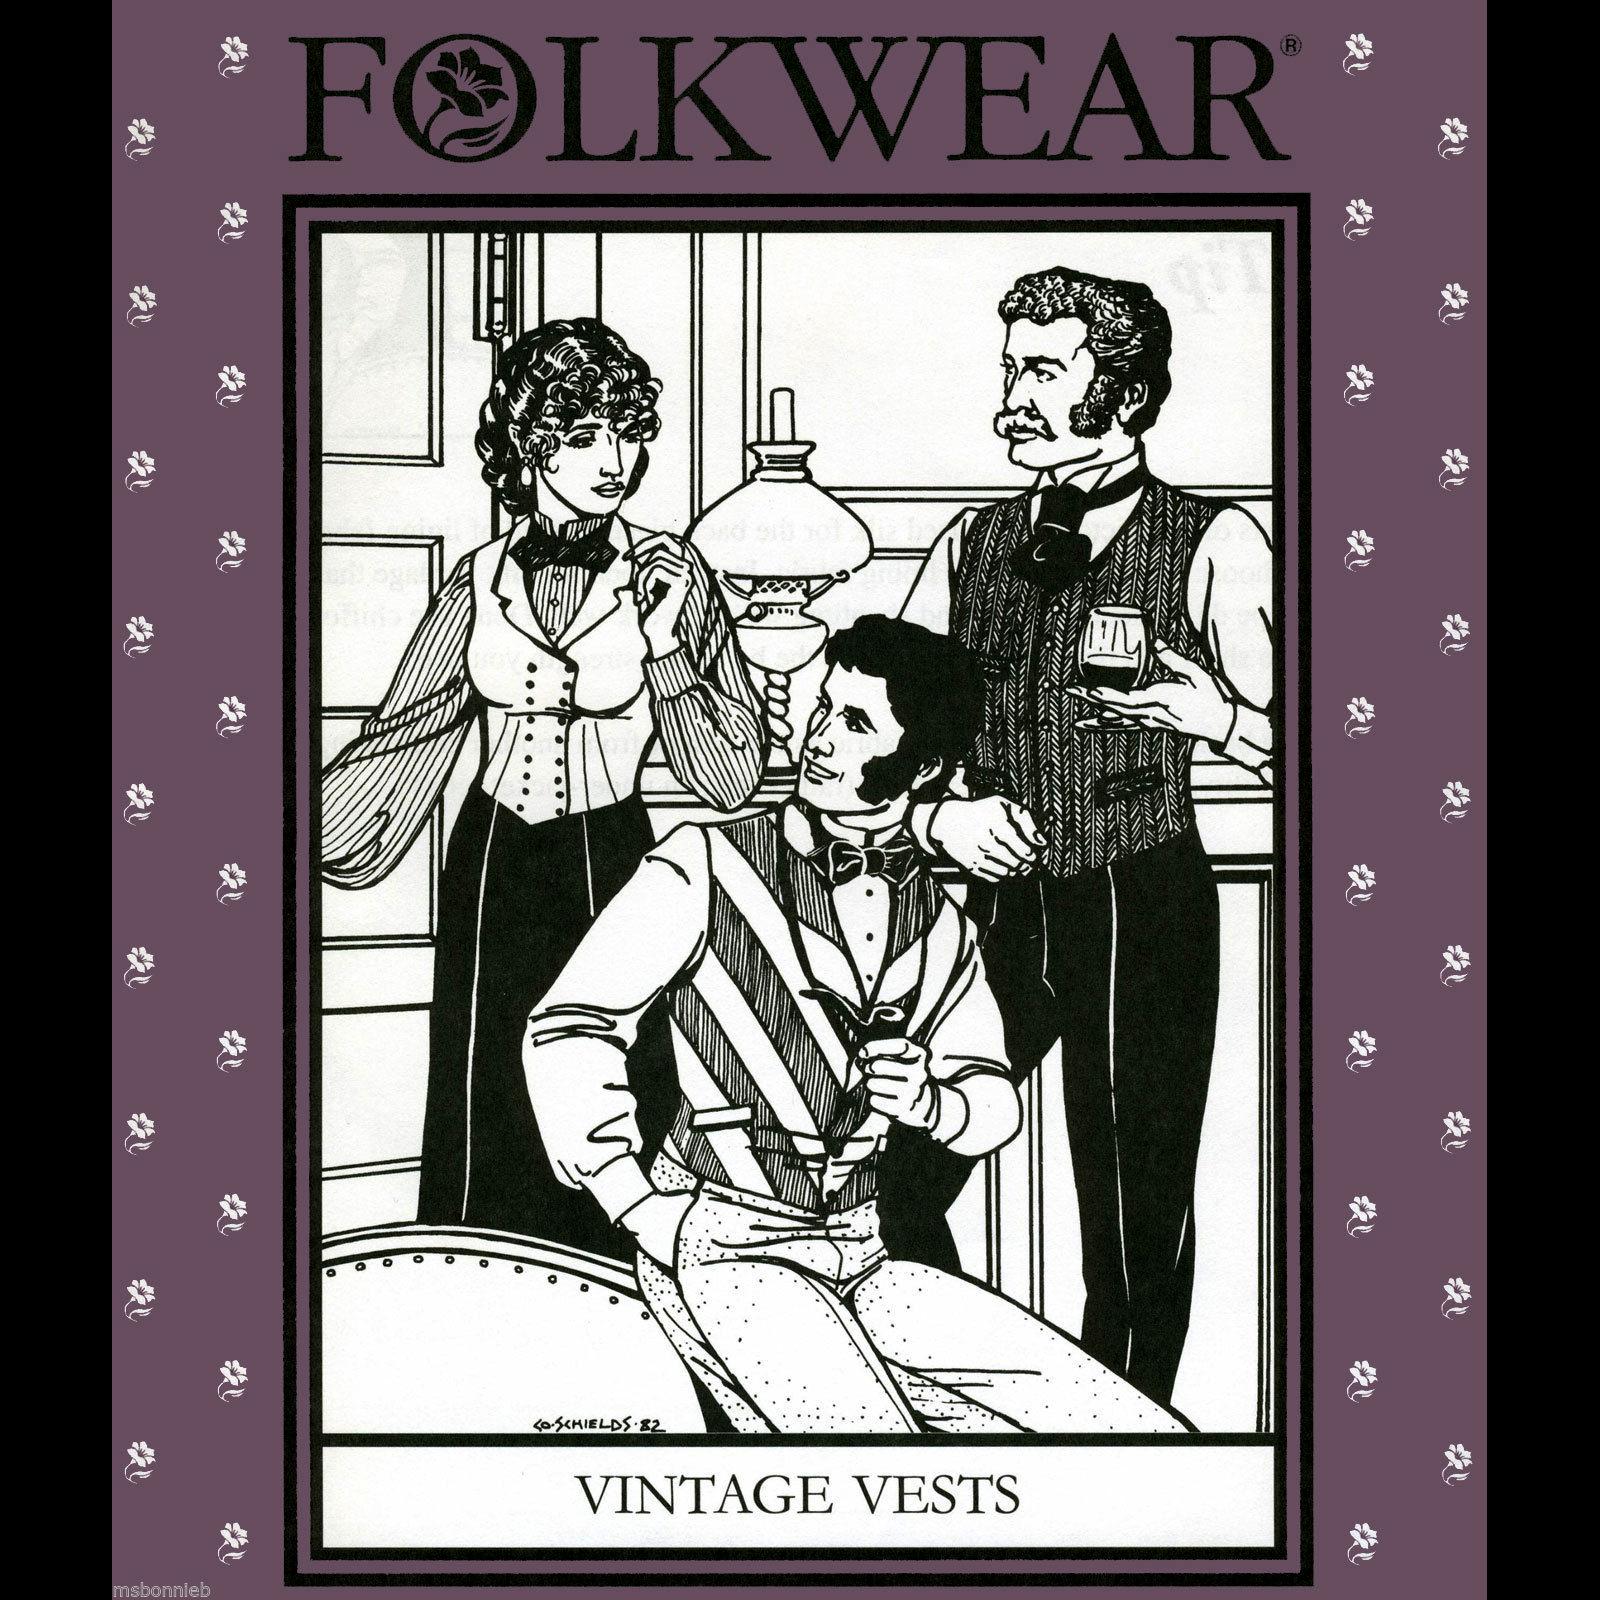 Folkwear vest pattern cover